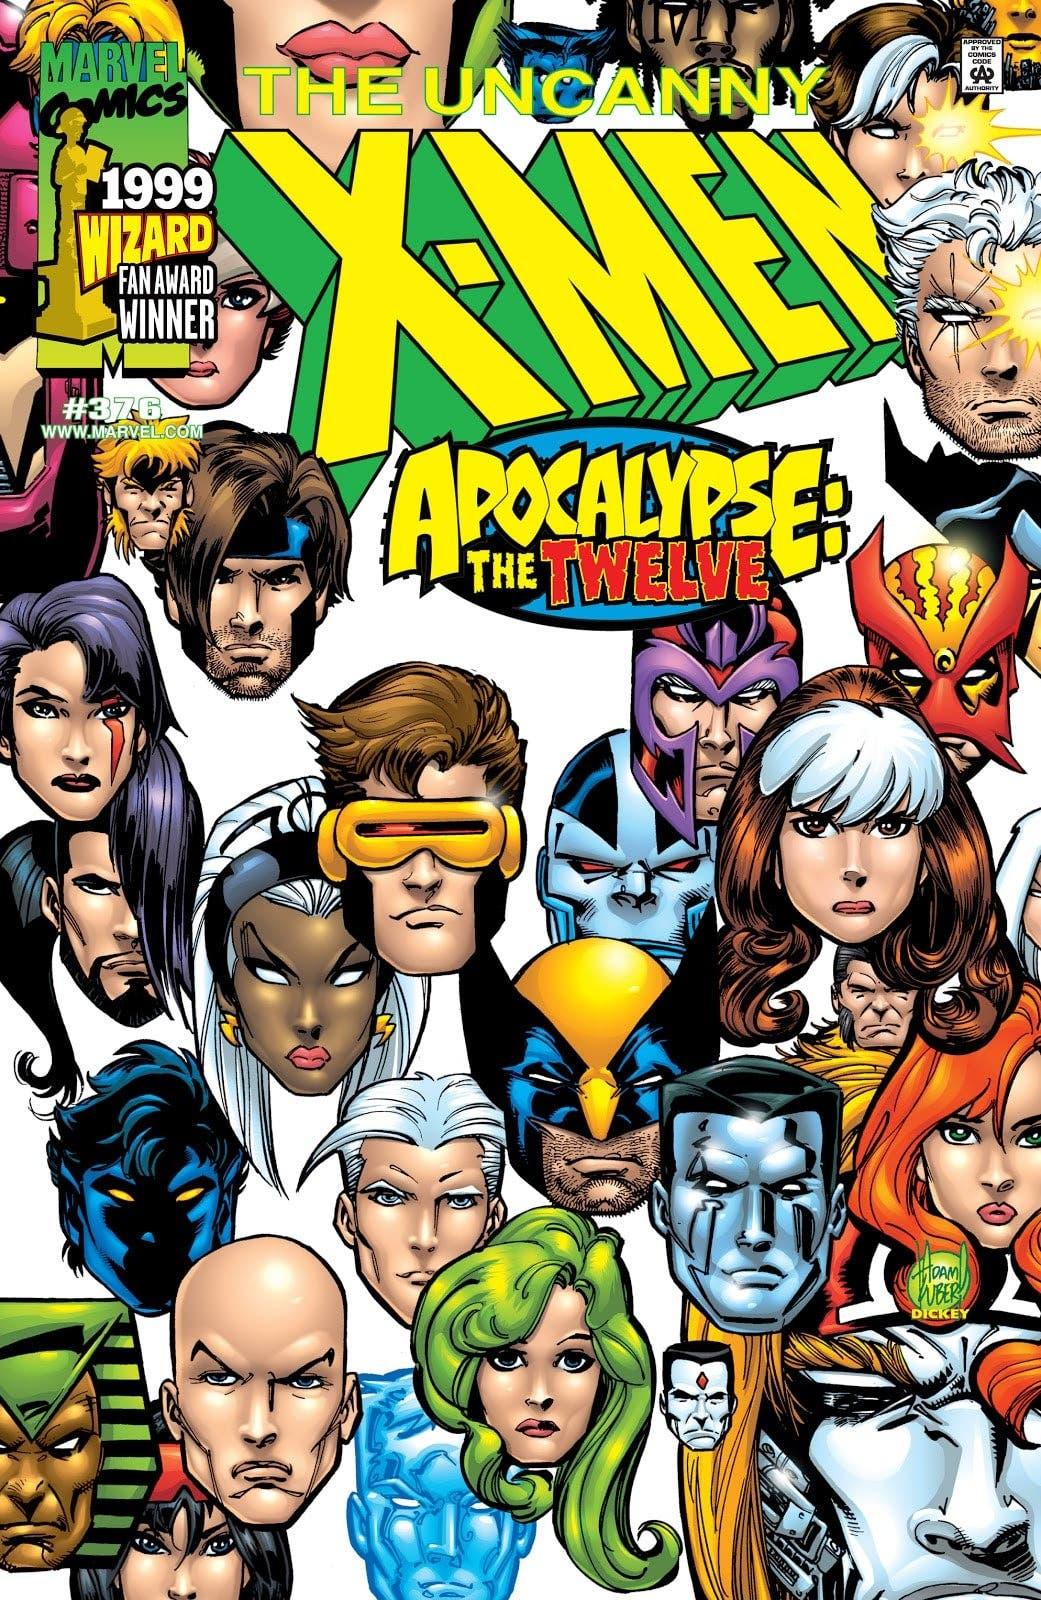 niveles de poder mutante x-men apocalypse Los doce